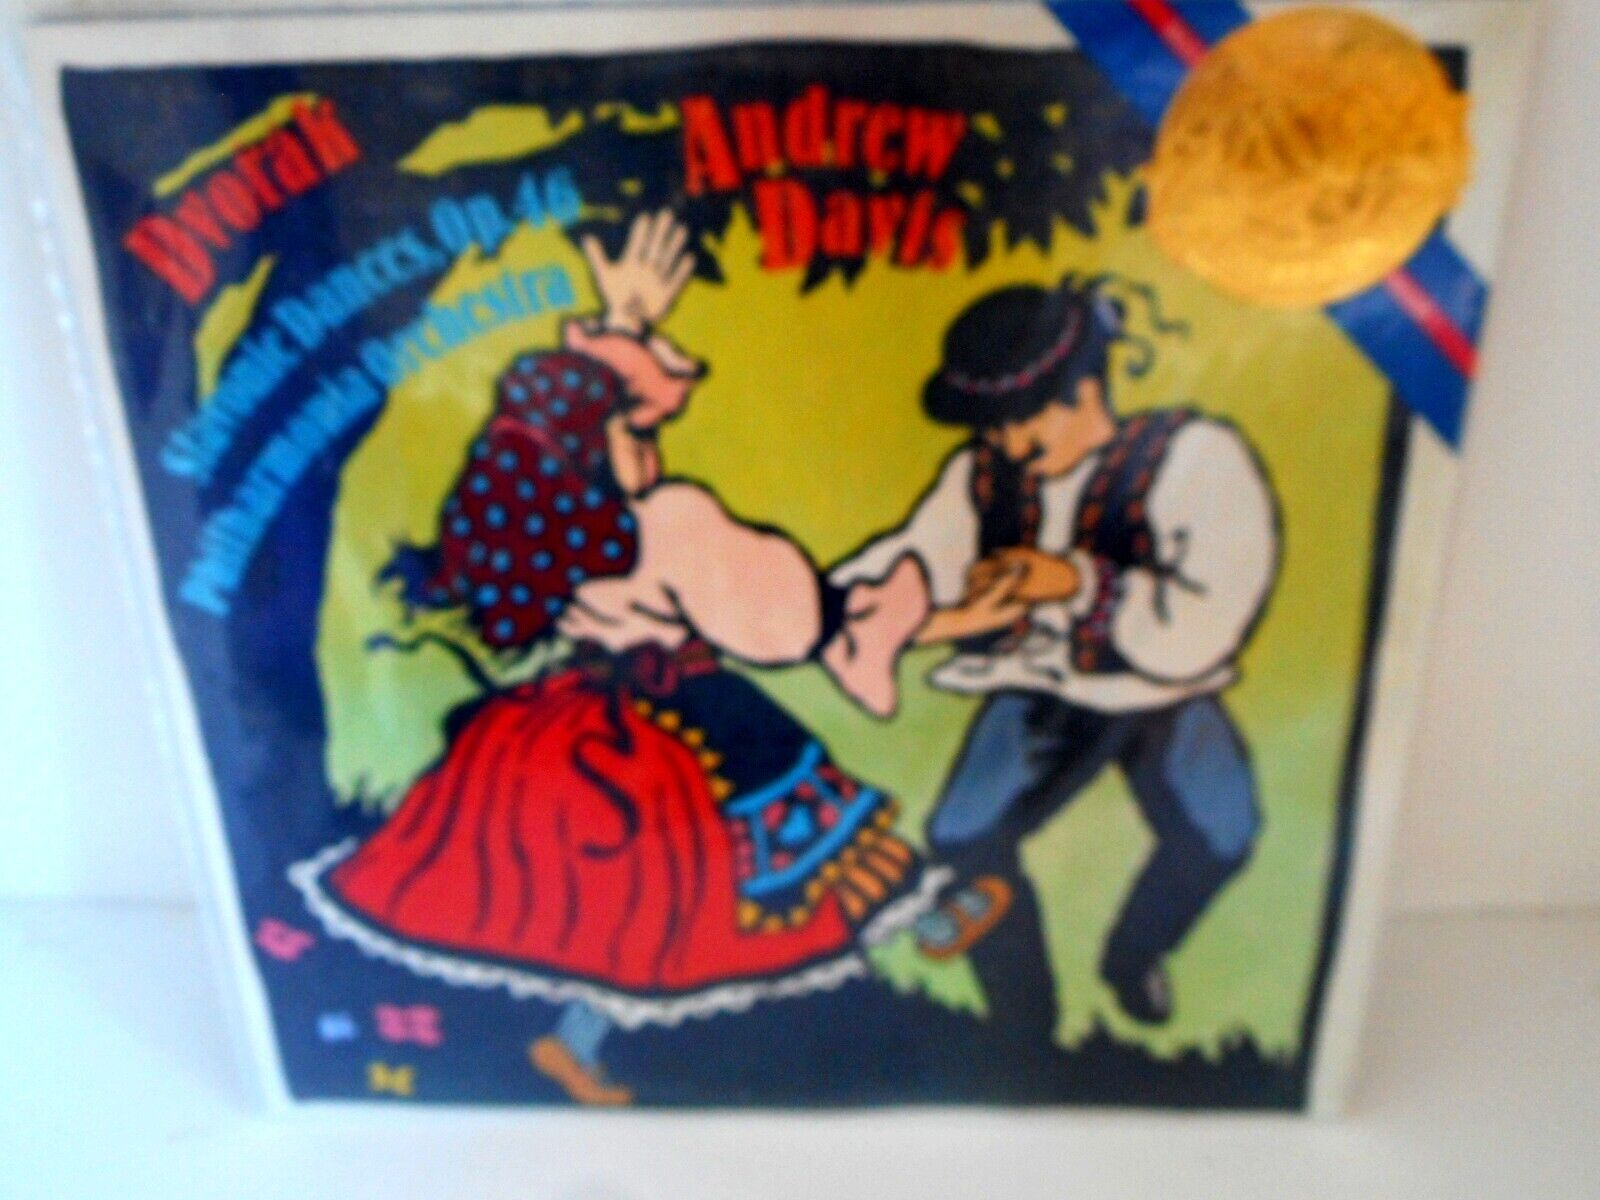 Philharmonia Orchestra / Andrew Davis - Dvorak Slavonic Dances Op. 46 Vinyl LP